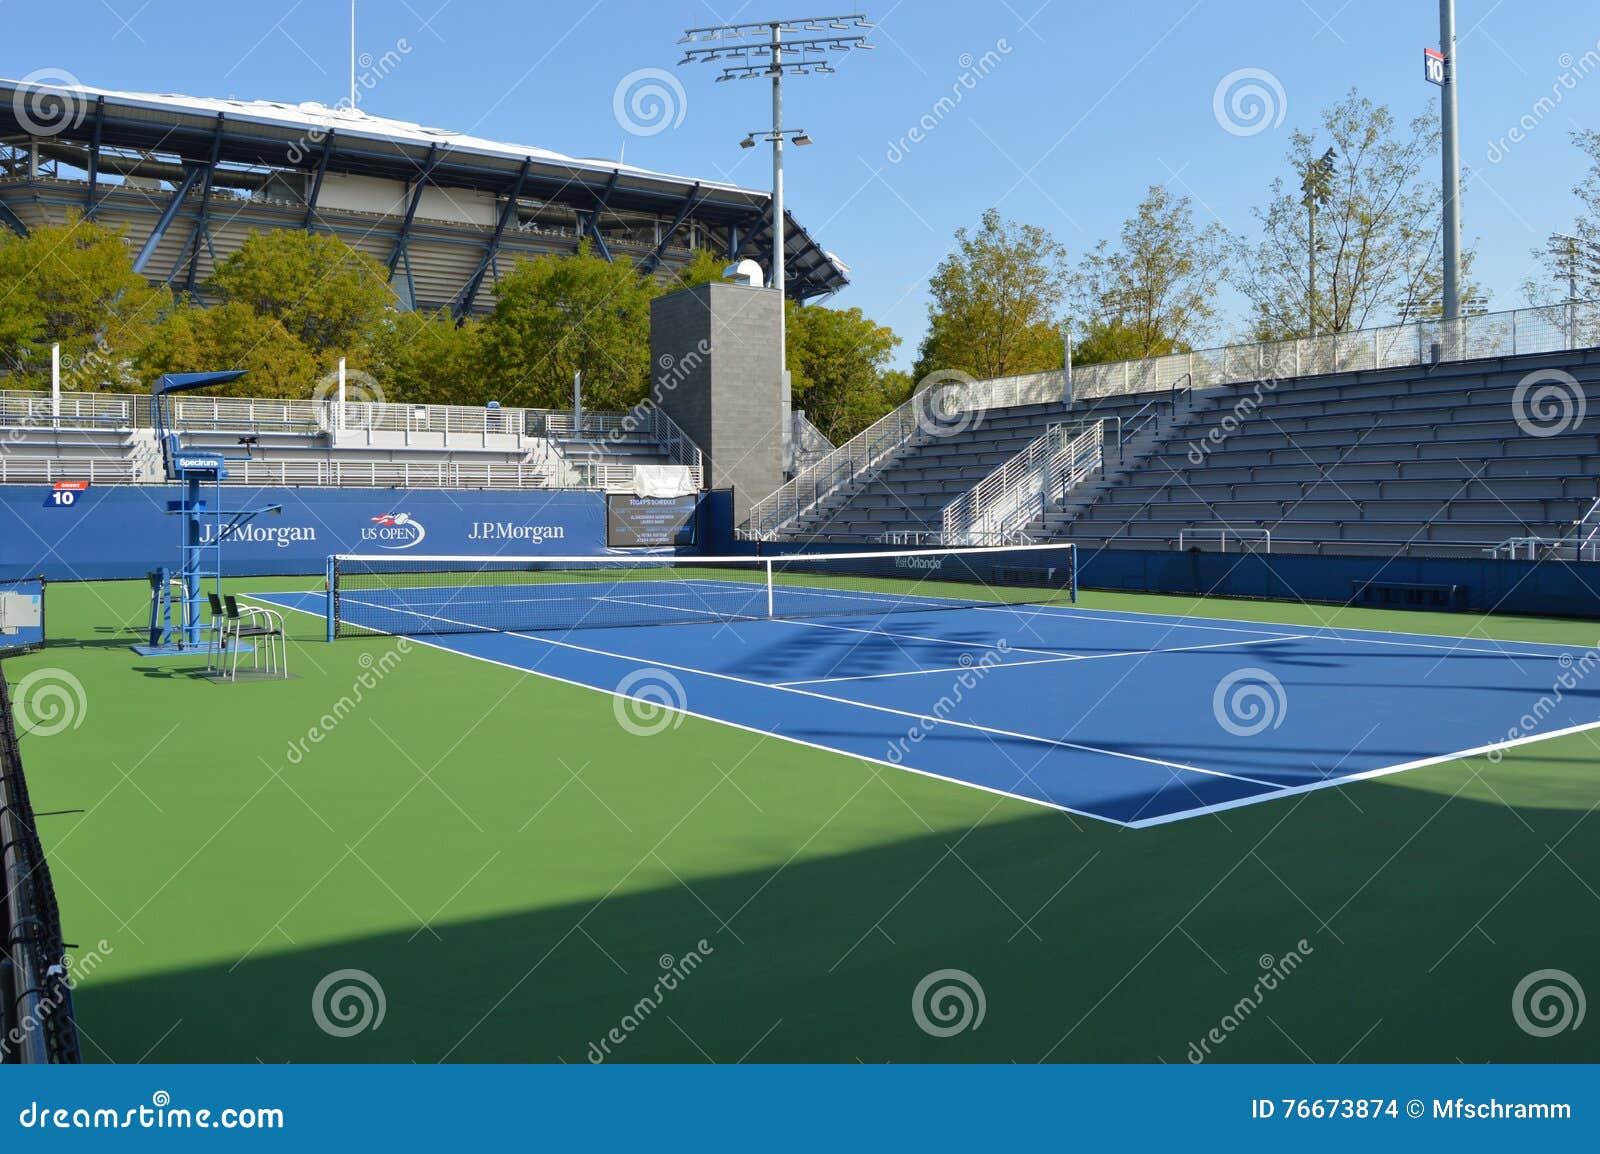 Us Open Tennis Court Editorial Stock Image Image Of Usta 76673874